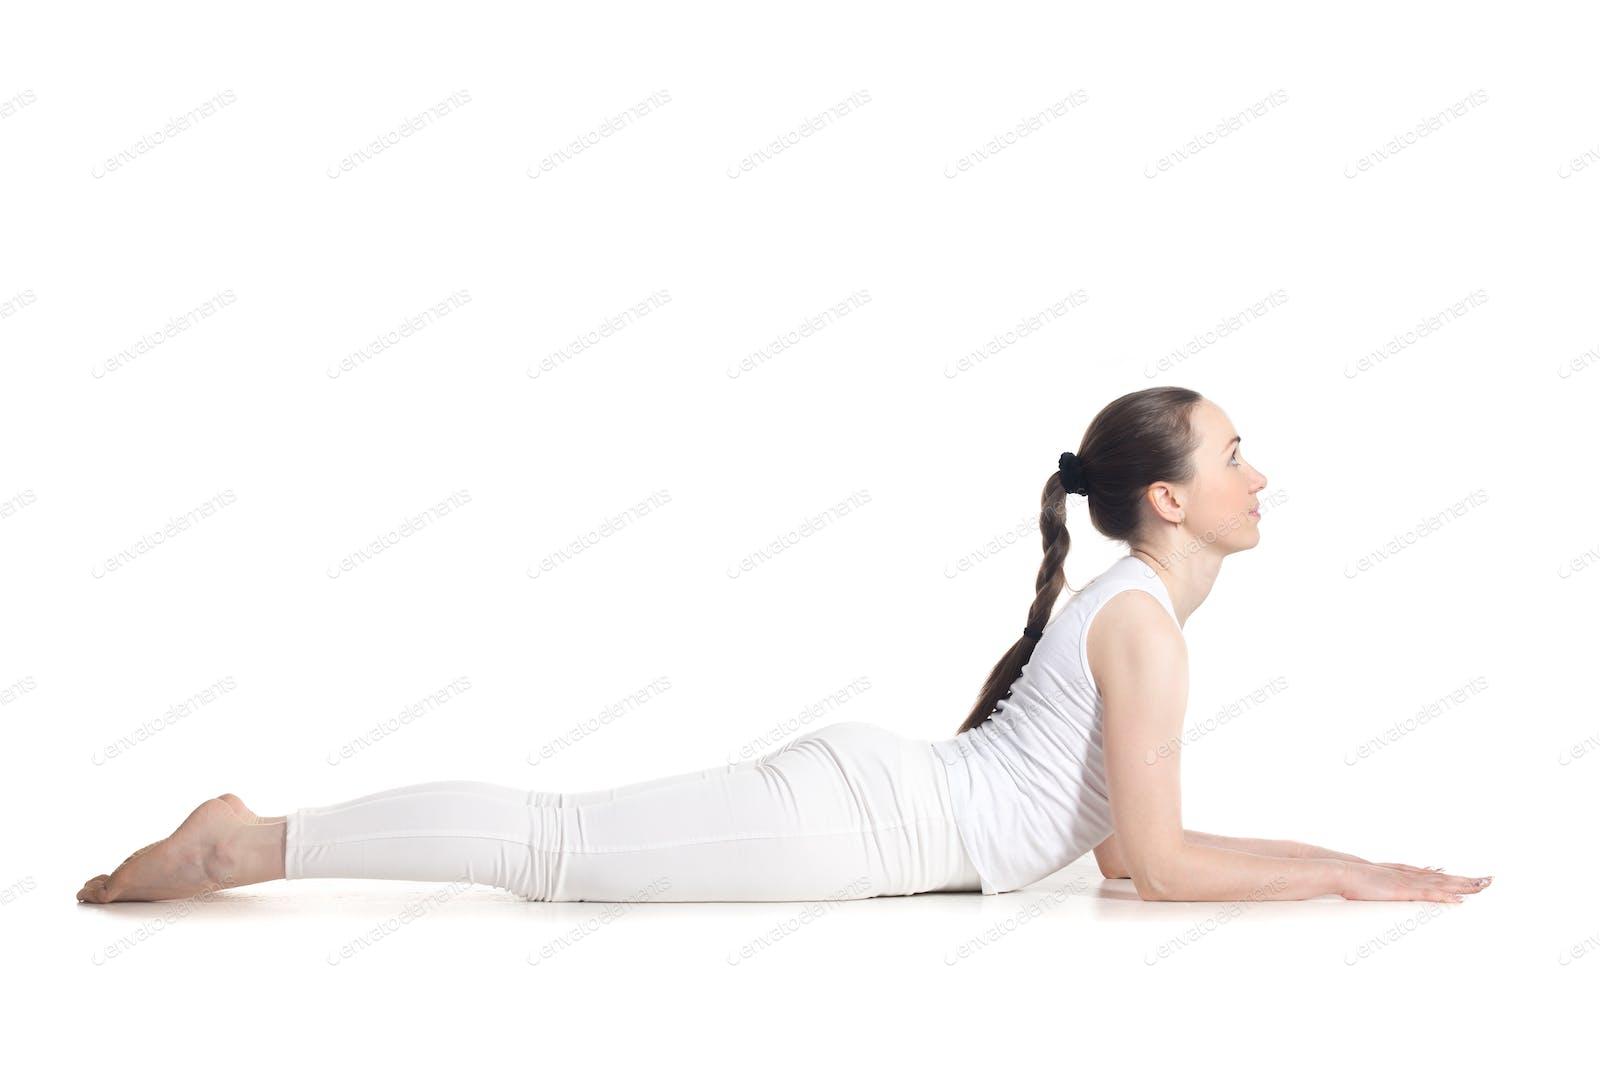 Sphinx yoga Pose photo by fizkes on Envato Elements